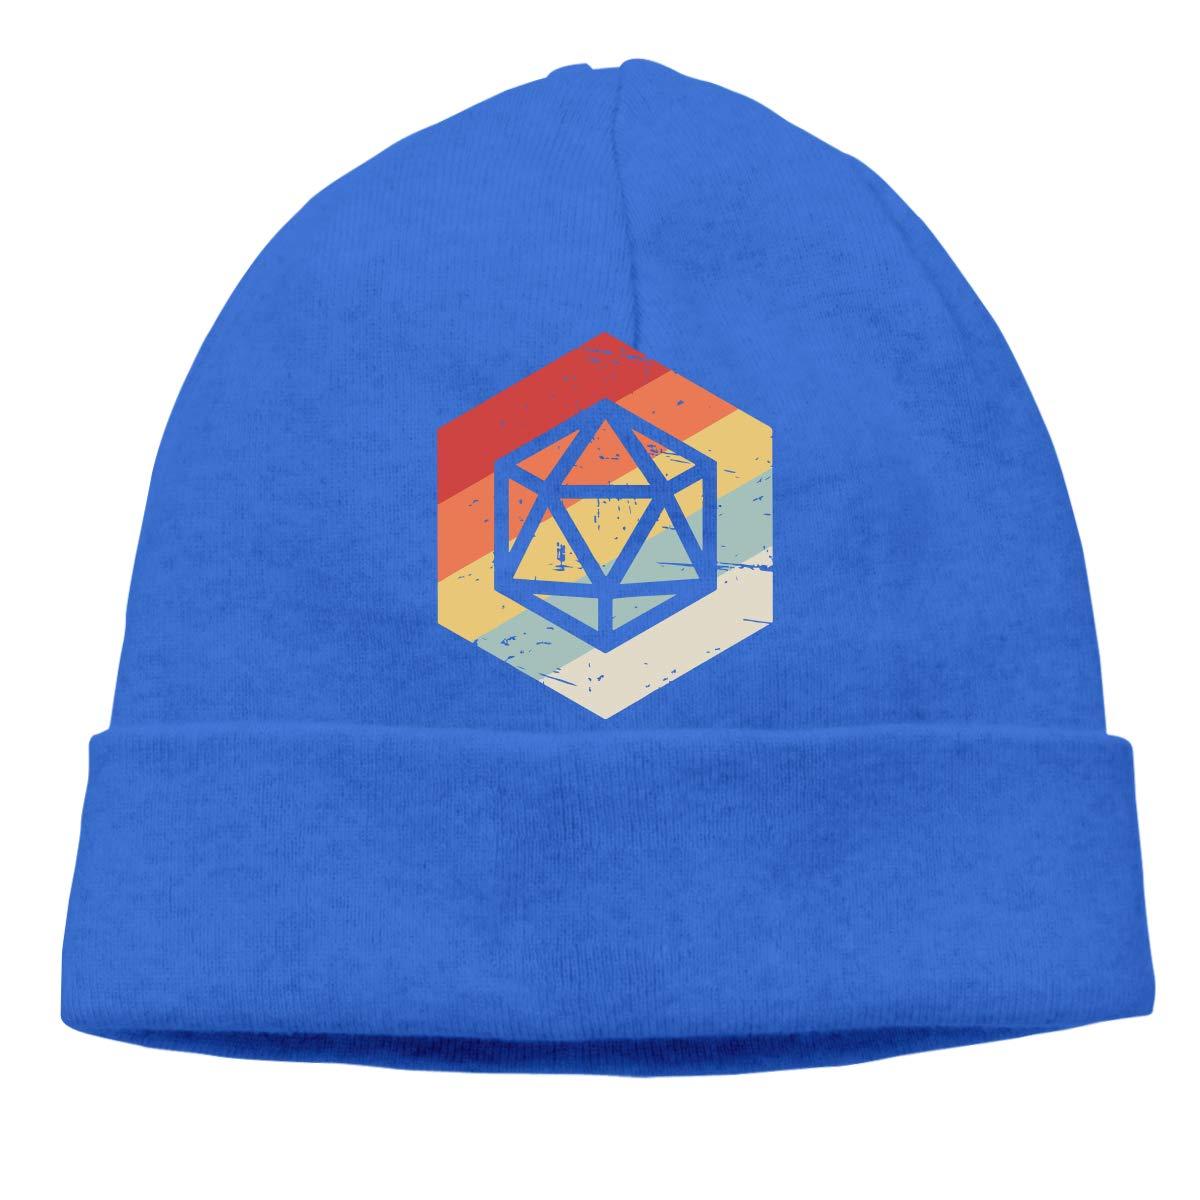 Unisex Retro Game Outdoor Warm Beanies Hat Soft Winter Skull Caps